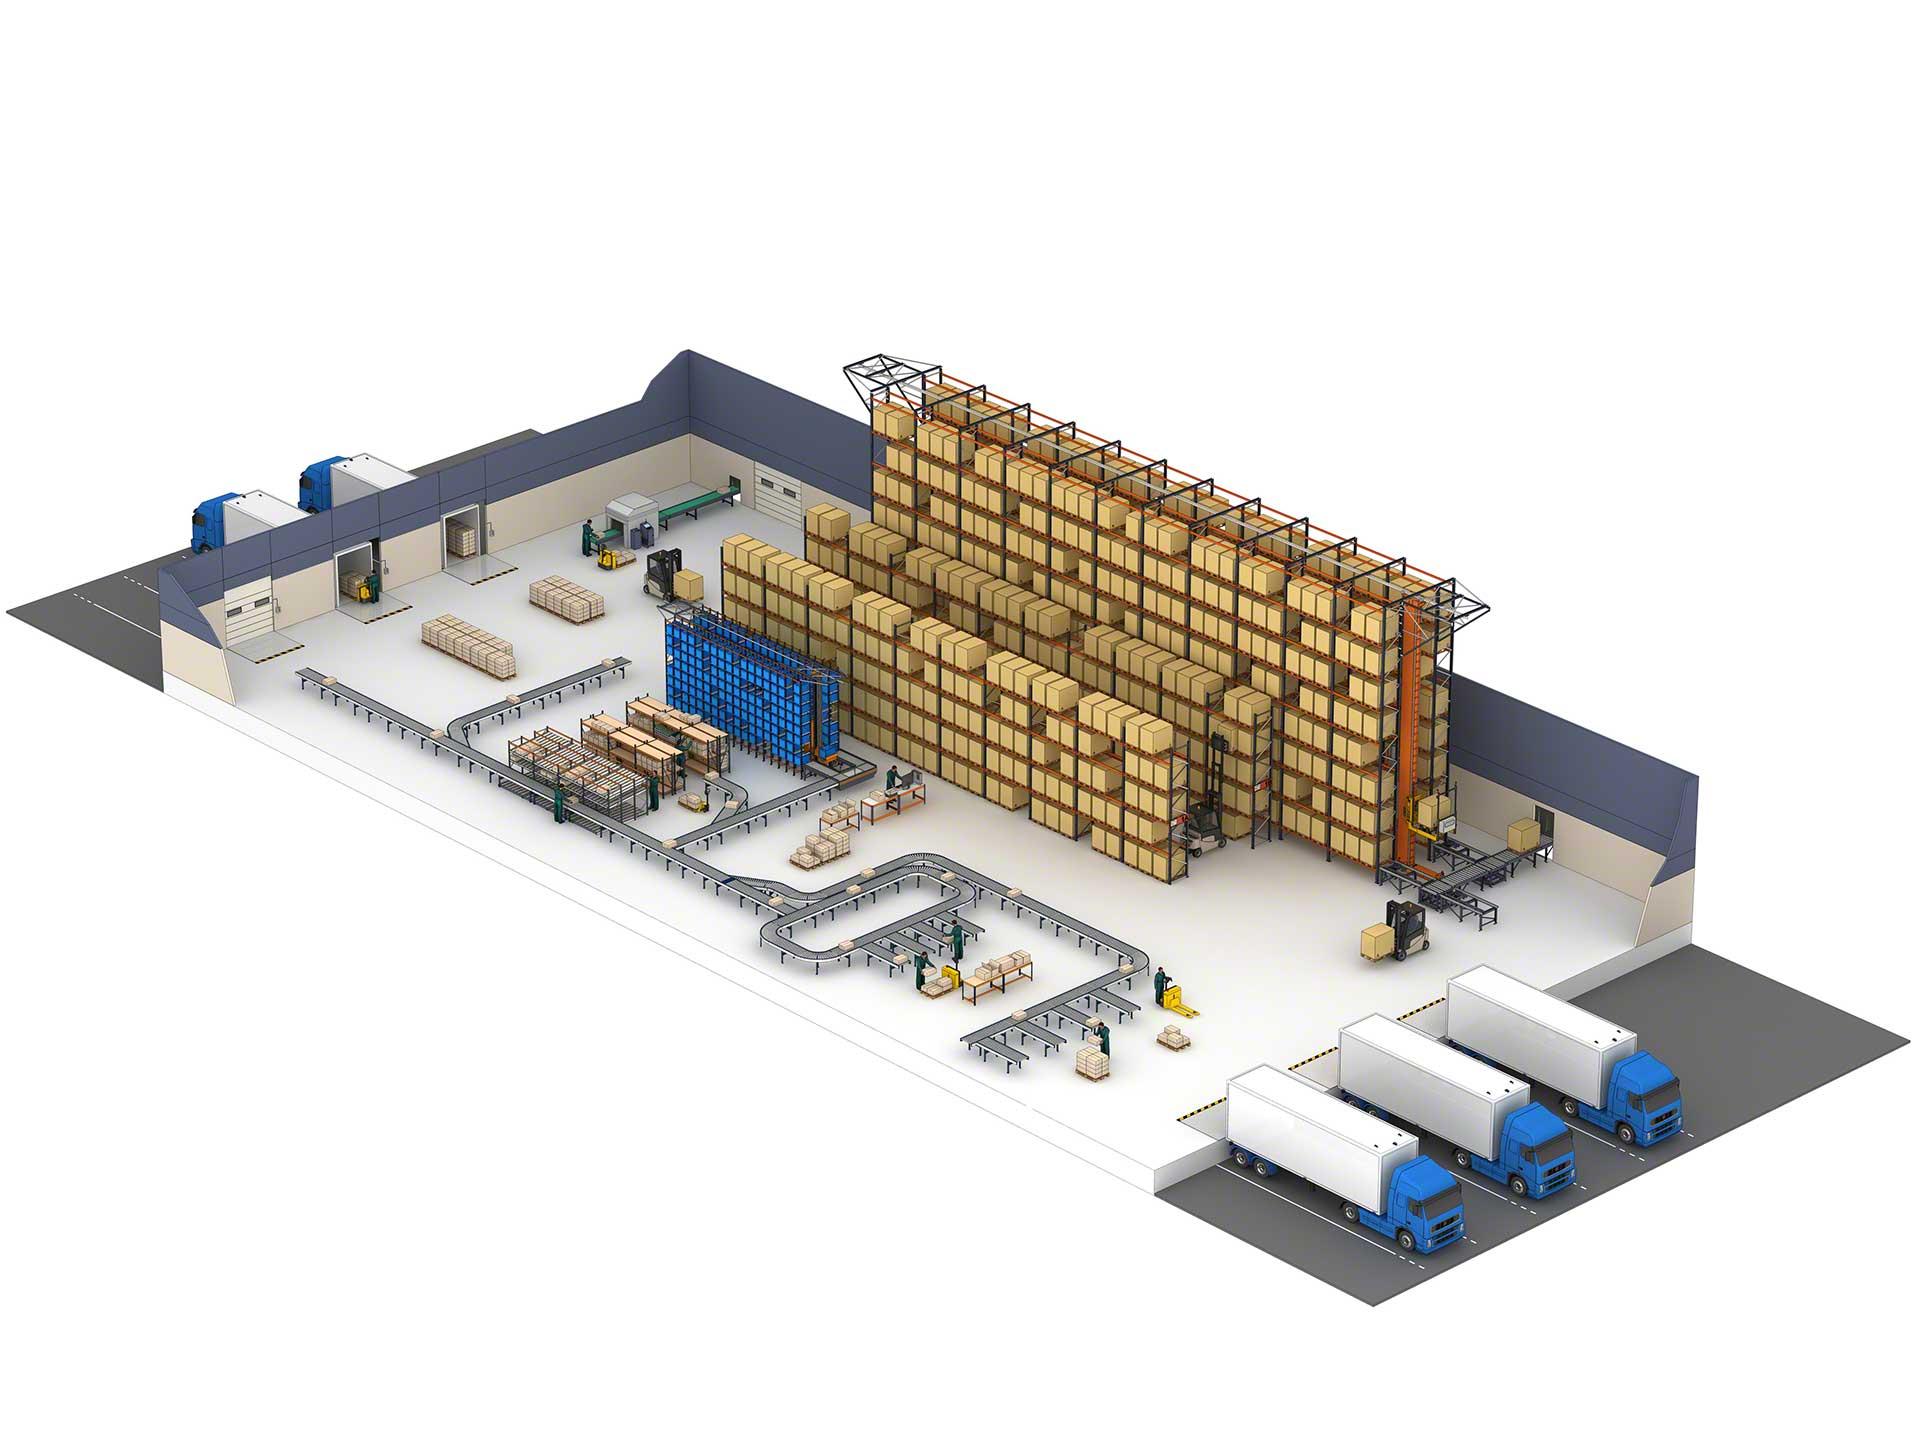 Rethink the warehouse's design